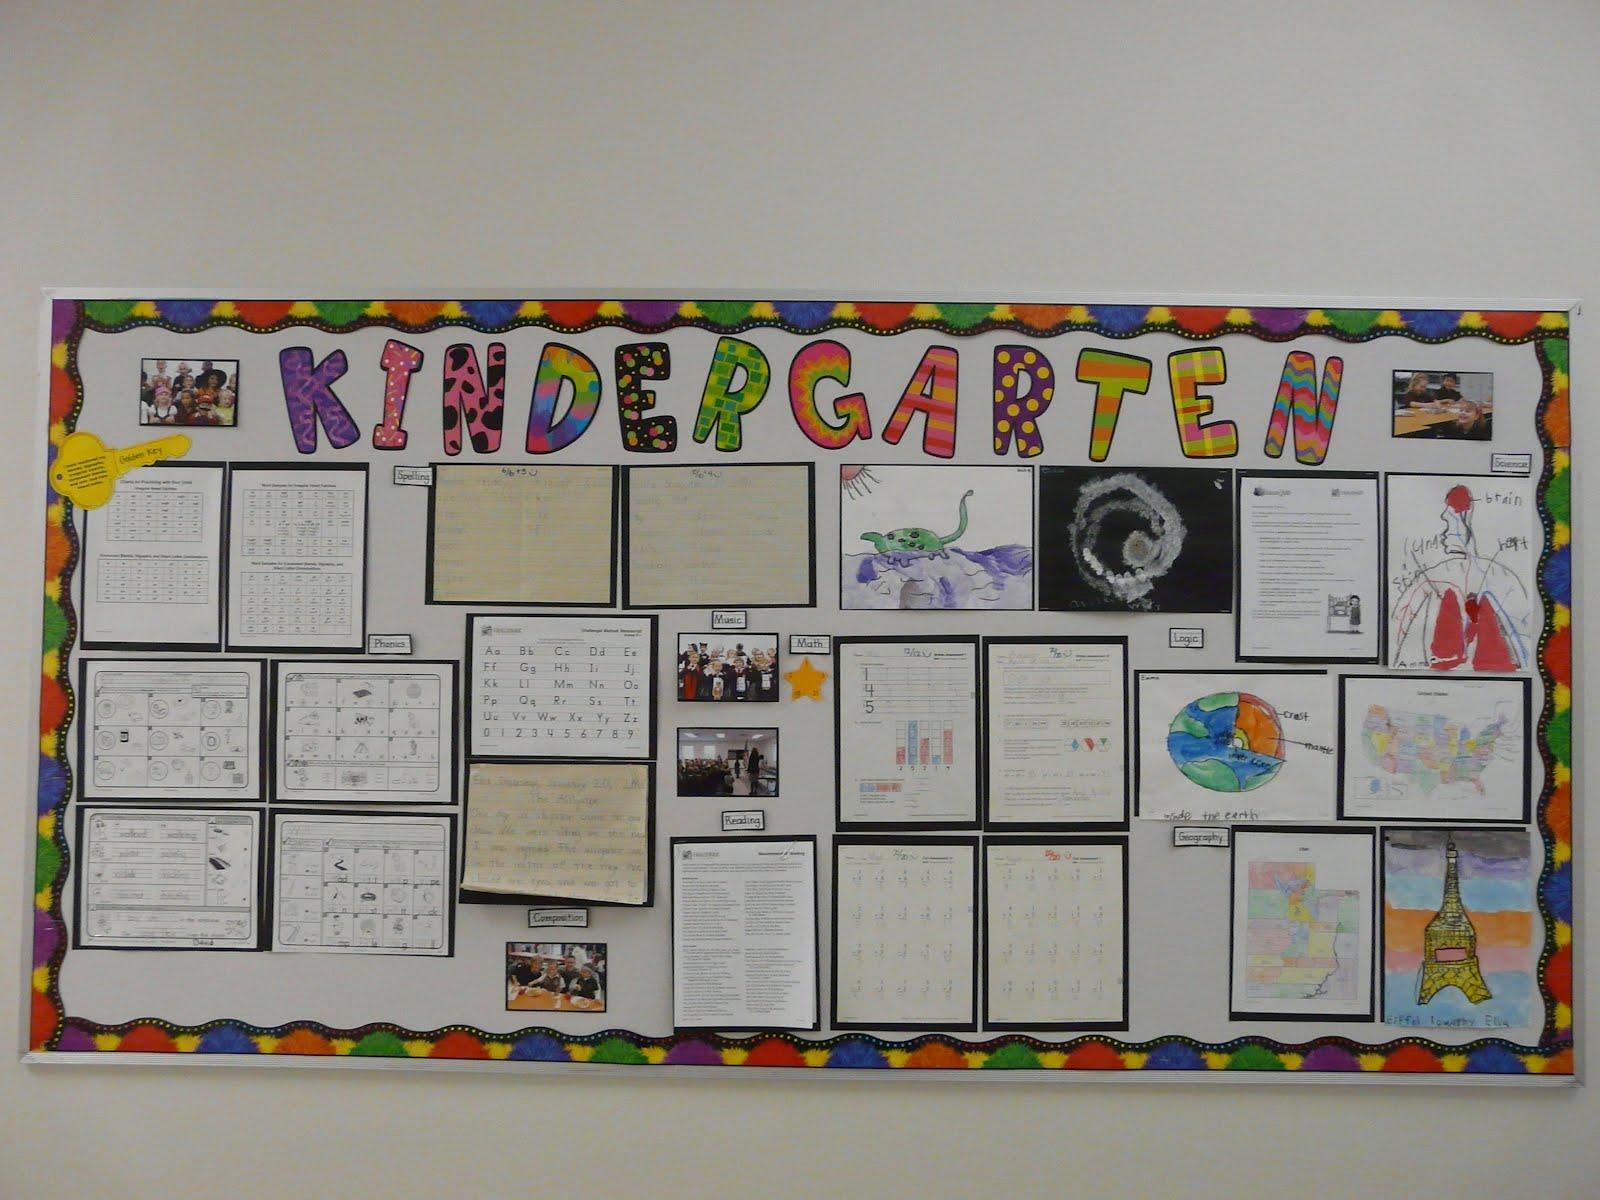 Bulletin Board Ideas: Kindergarten - Fall 2011